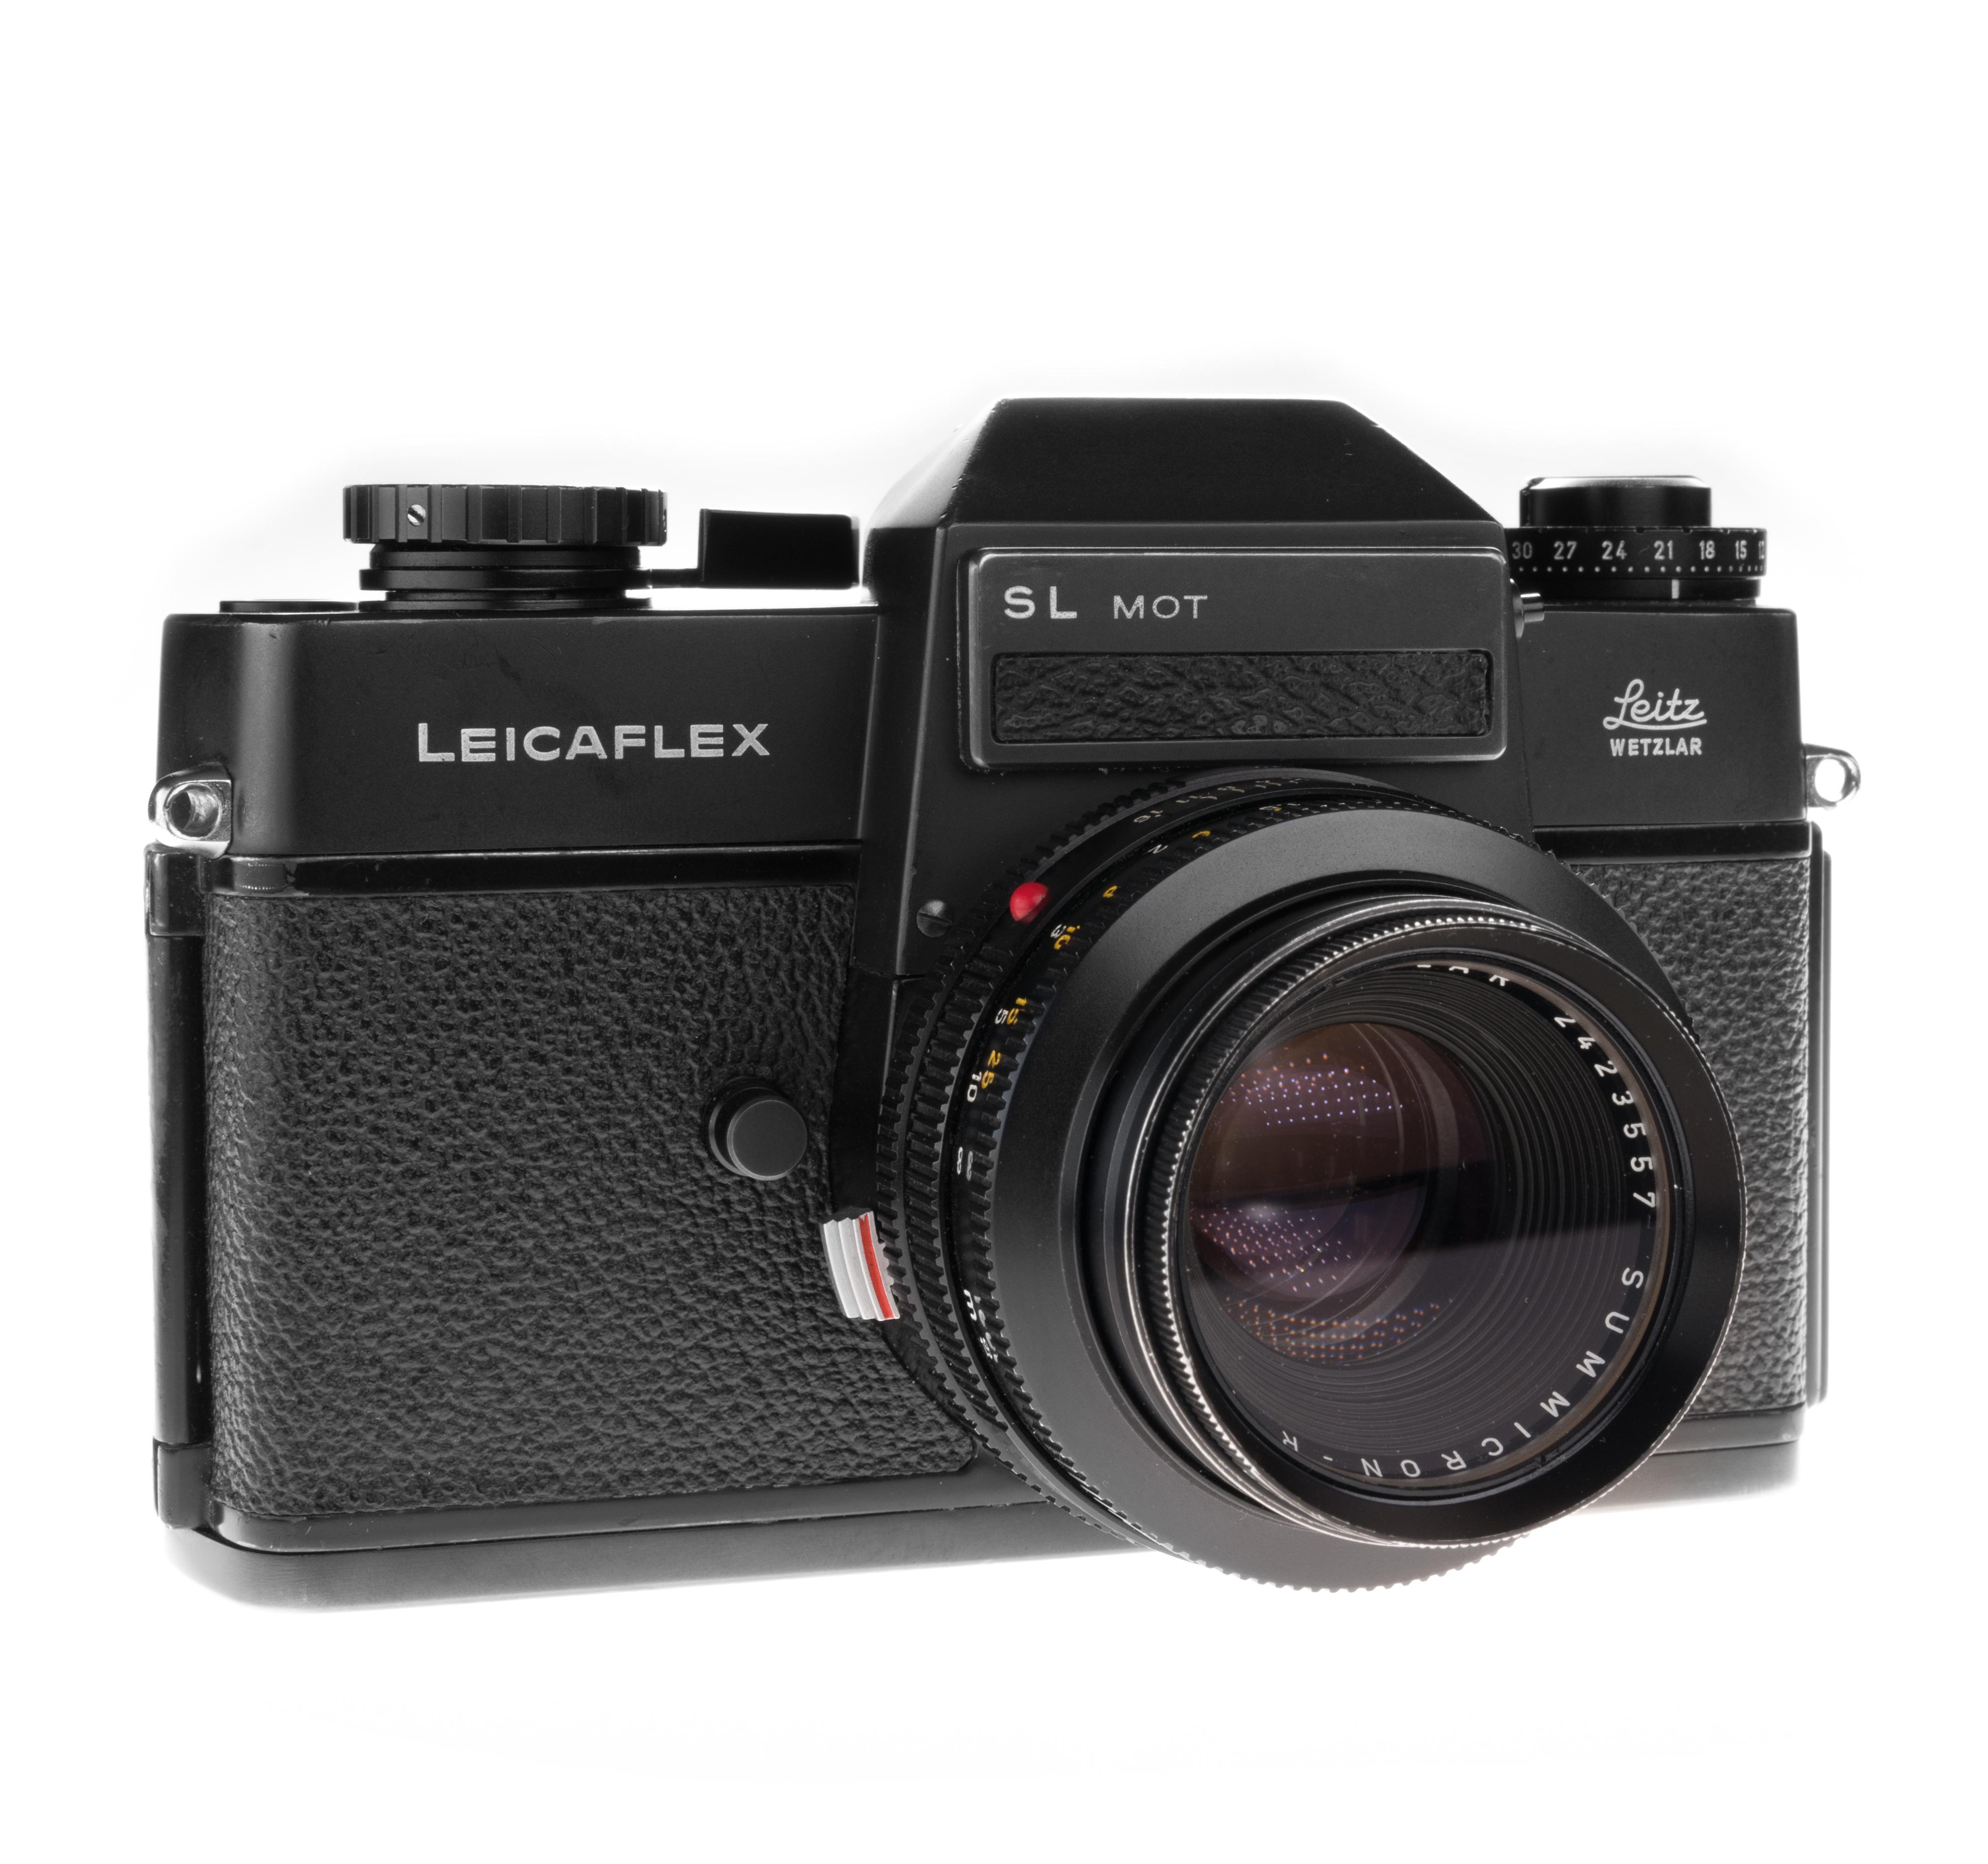 Gelegenheiten Leica SL Mot